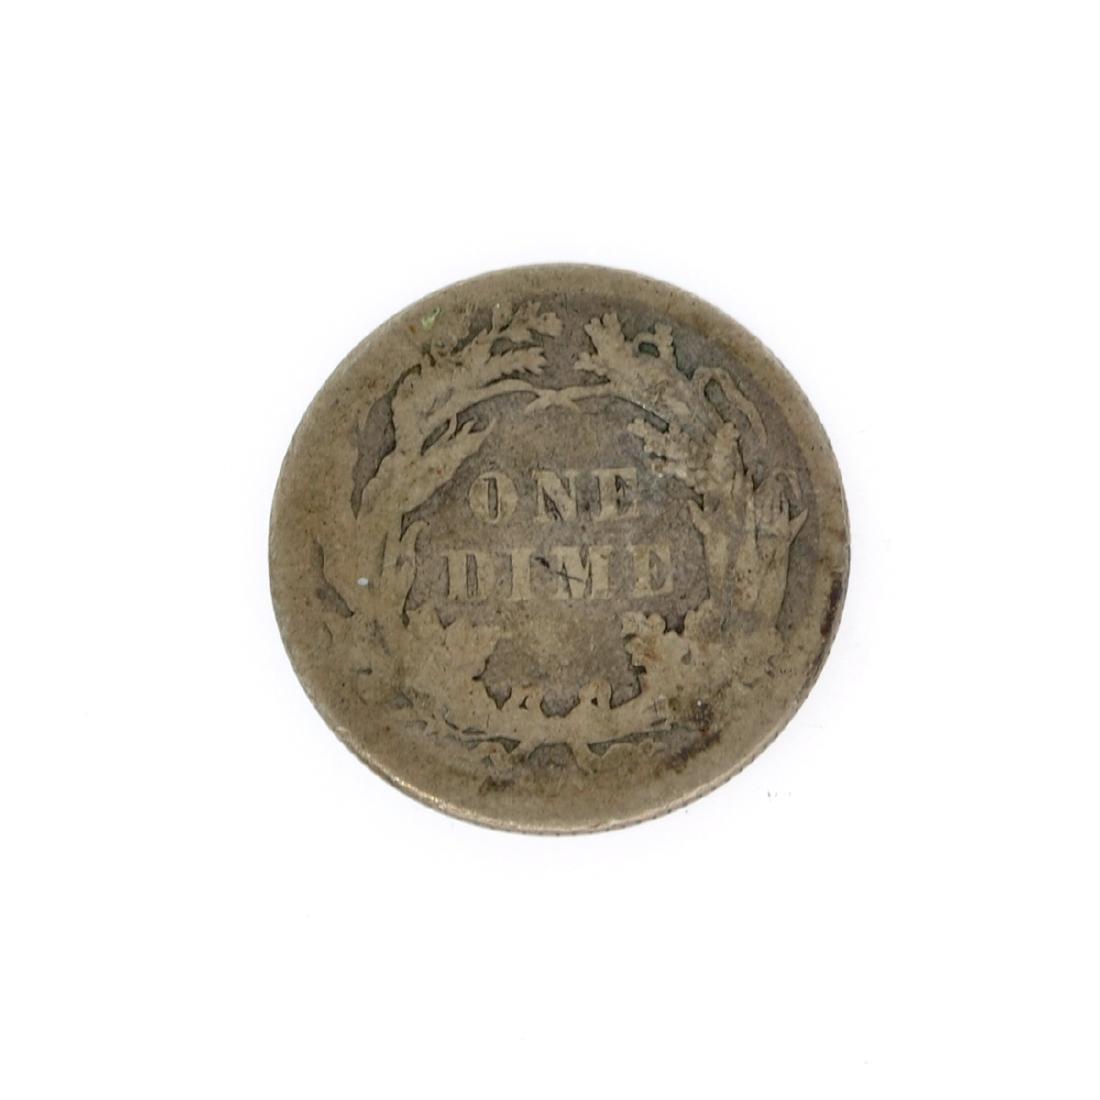 Rare 1886 Liberty Seated Dime Coin - 2